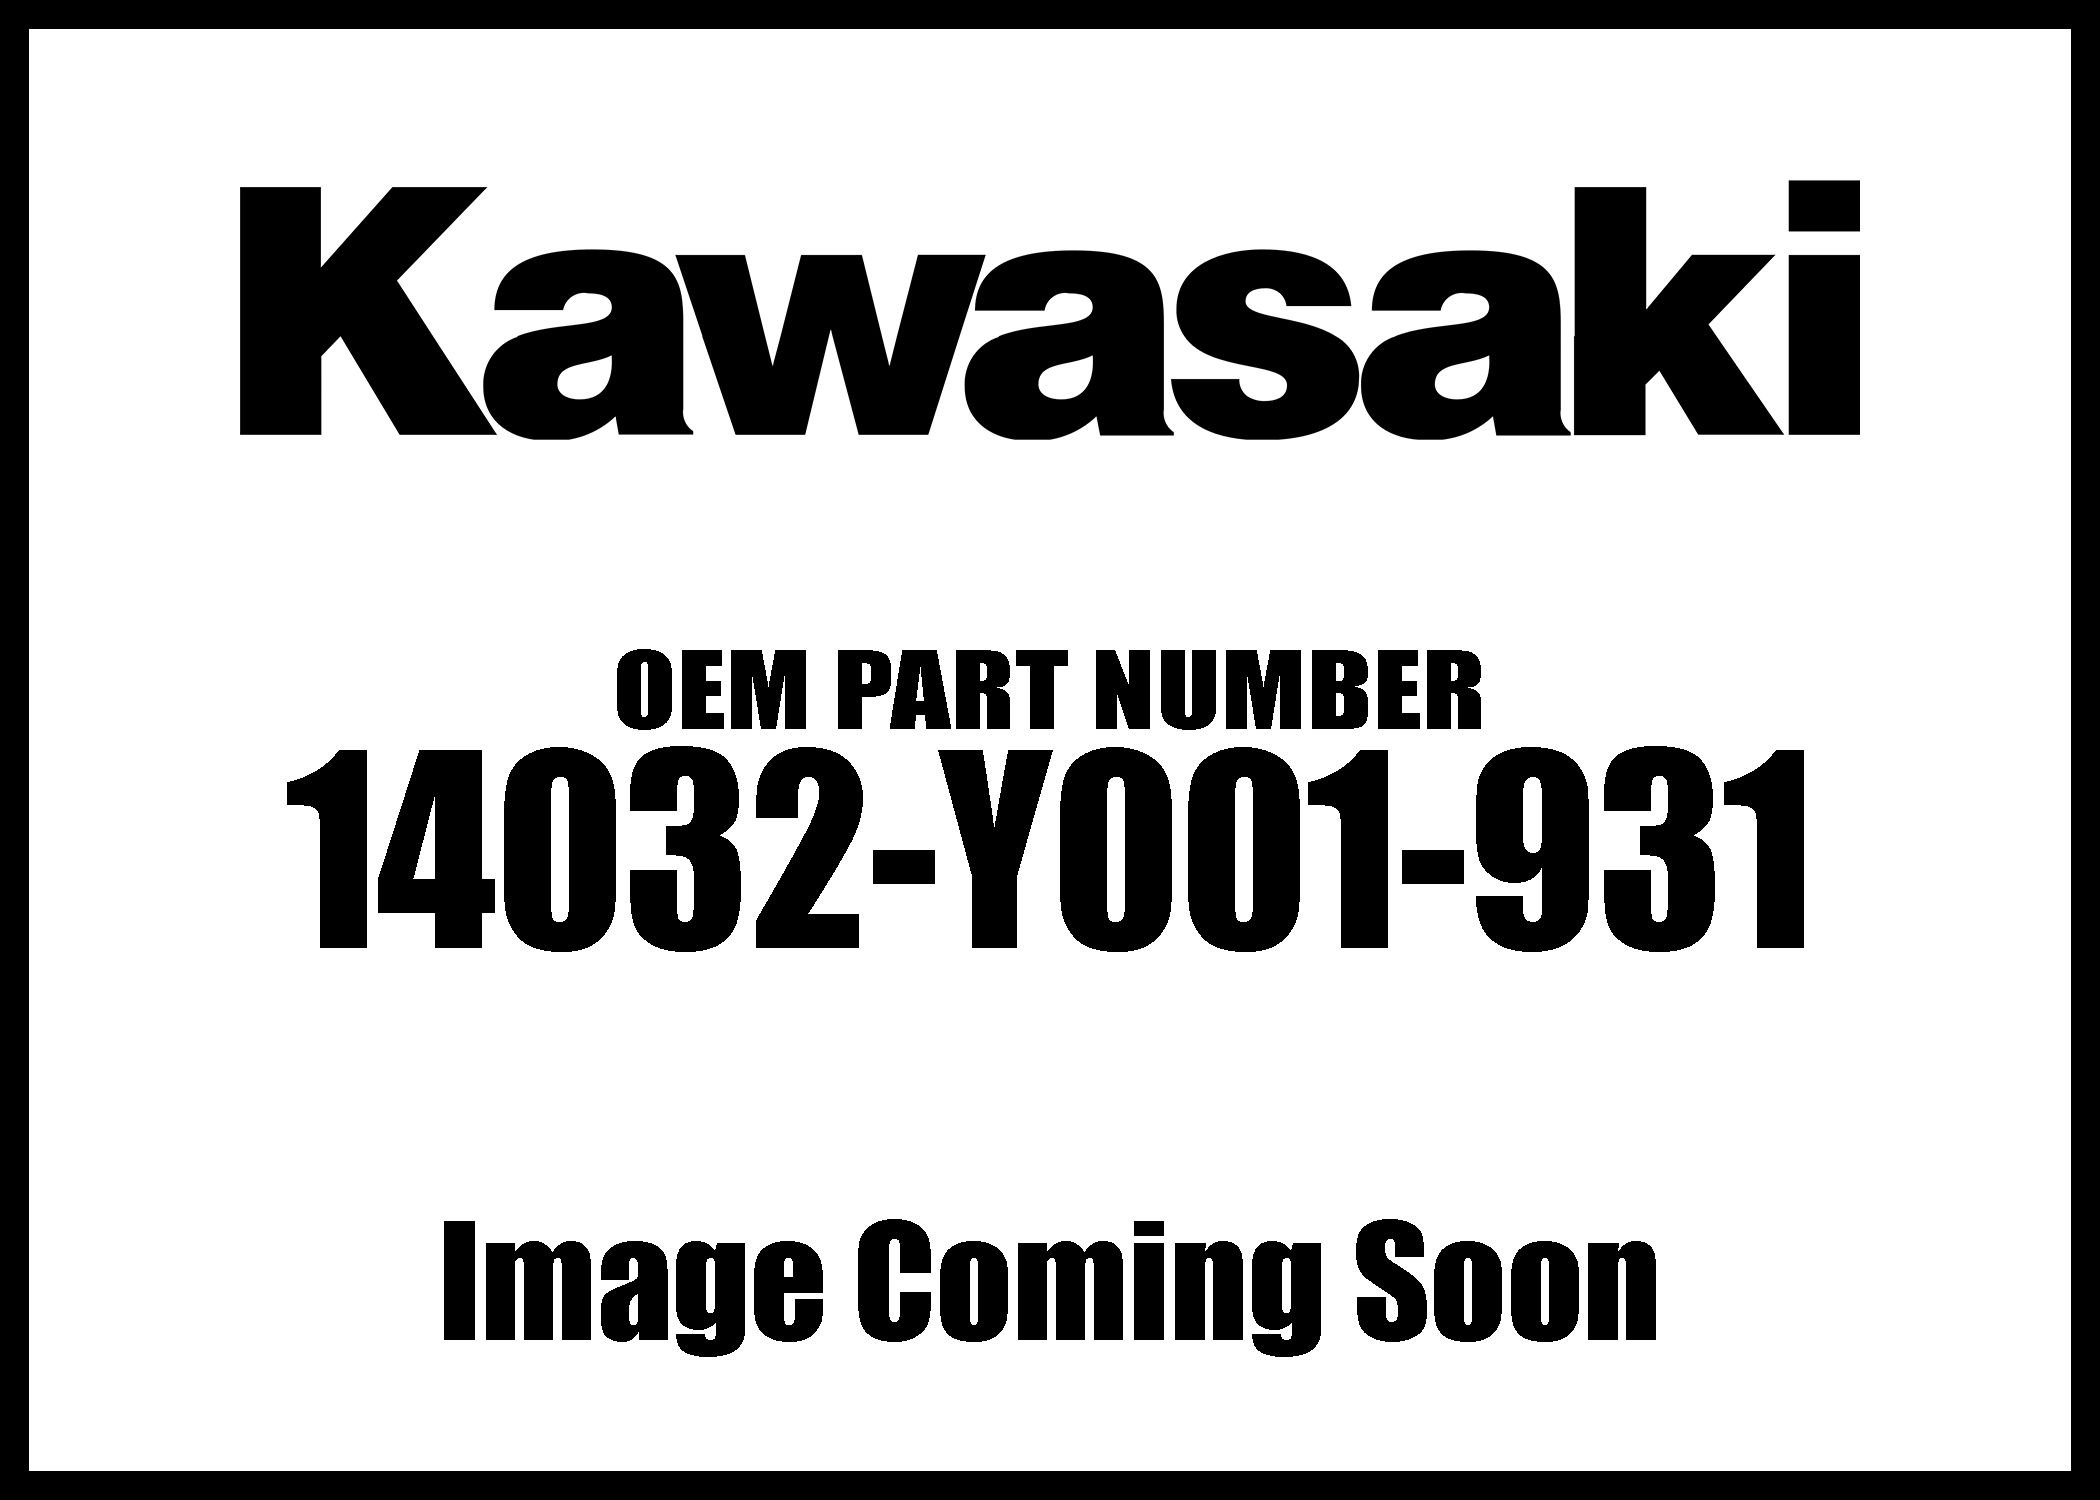 Kawasaki 2007-2017 Kfx50 Clutch Black Cover 14032-Y001-931 New Oem